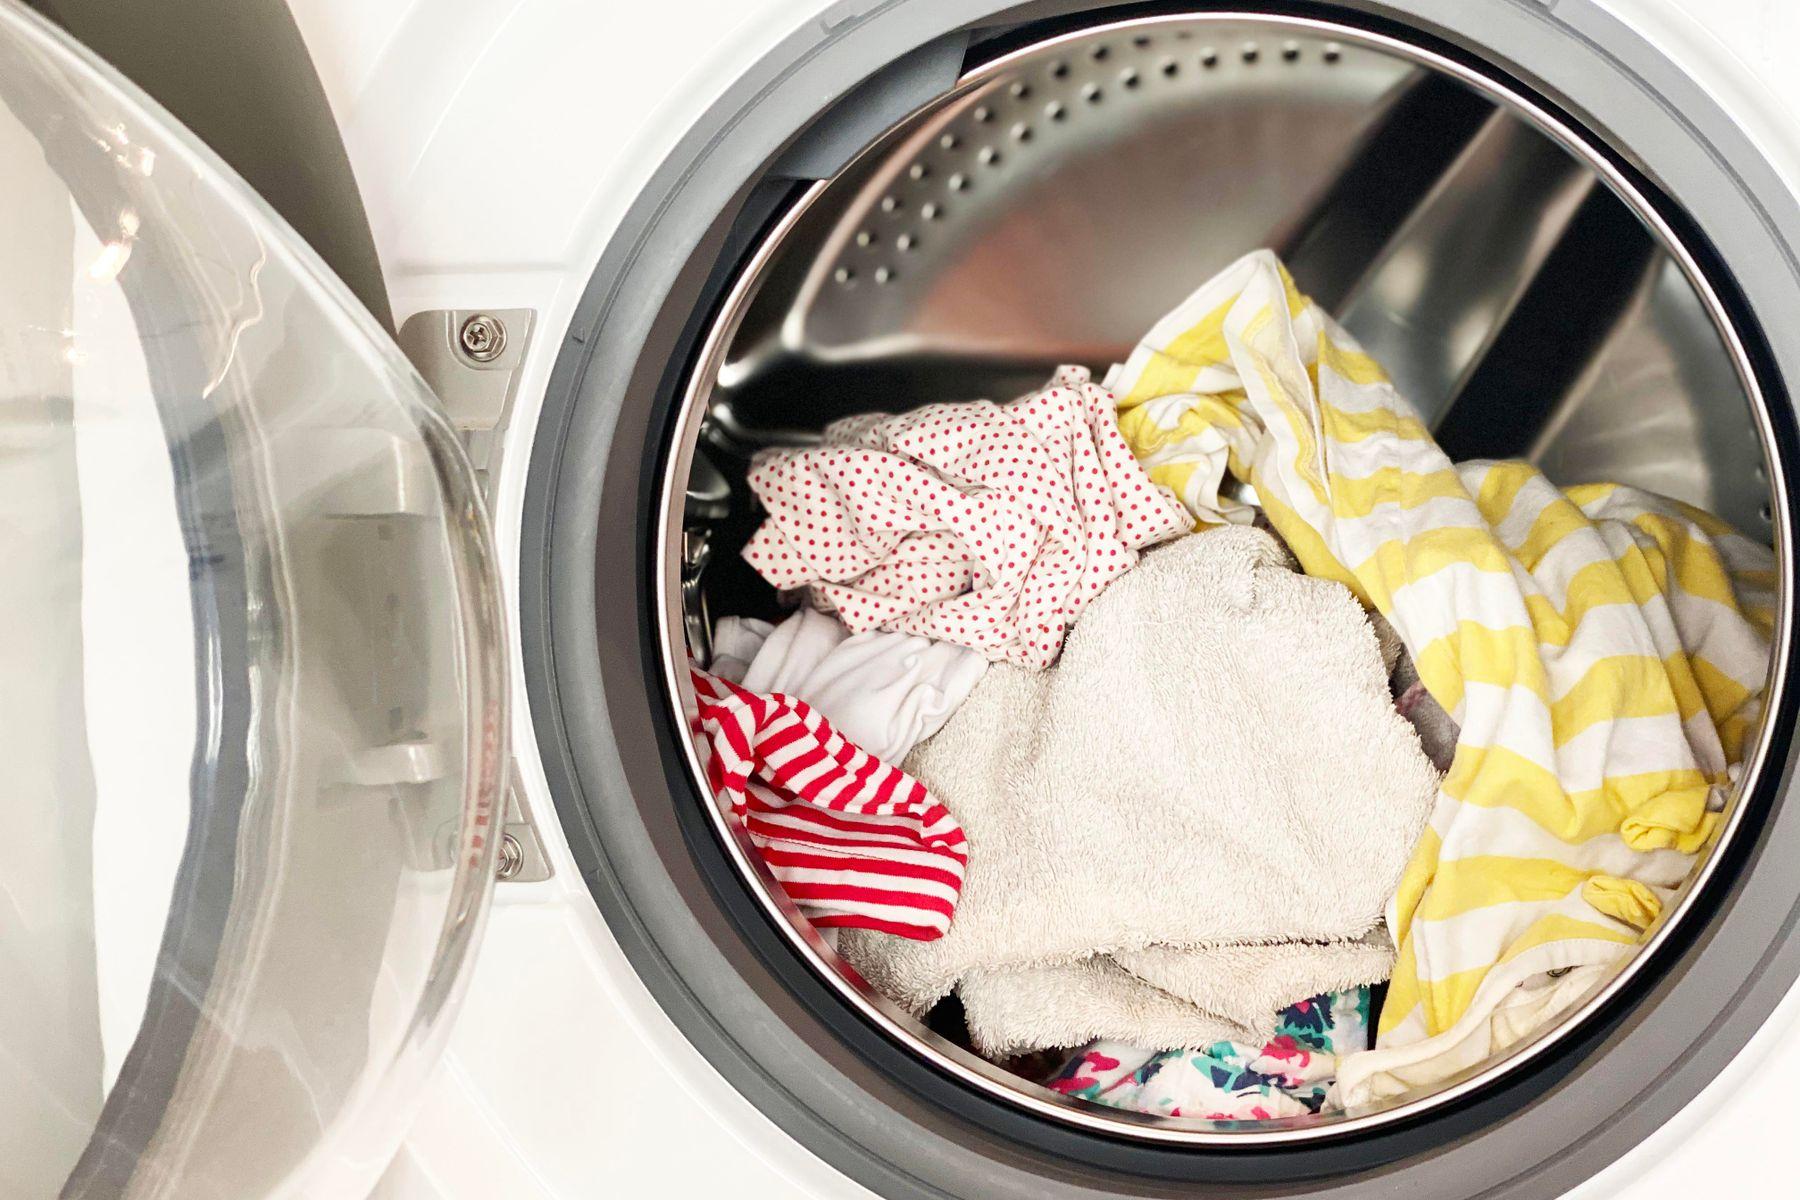 Colourful clothing inside a washing machine